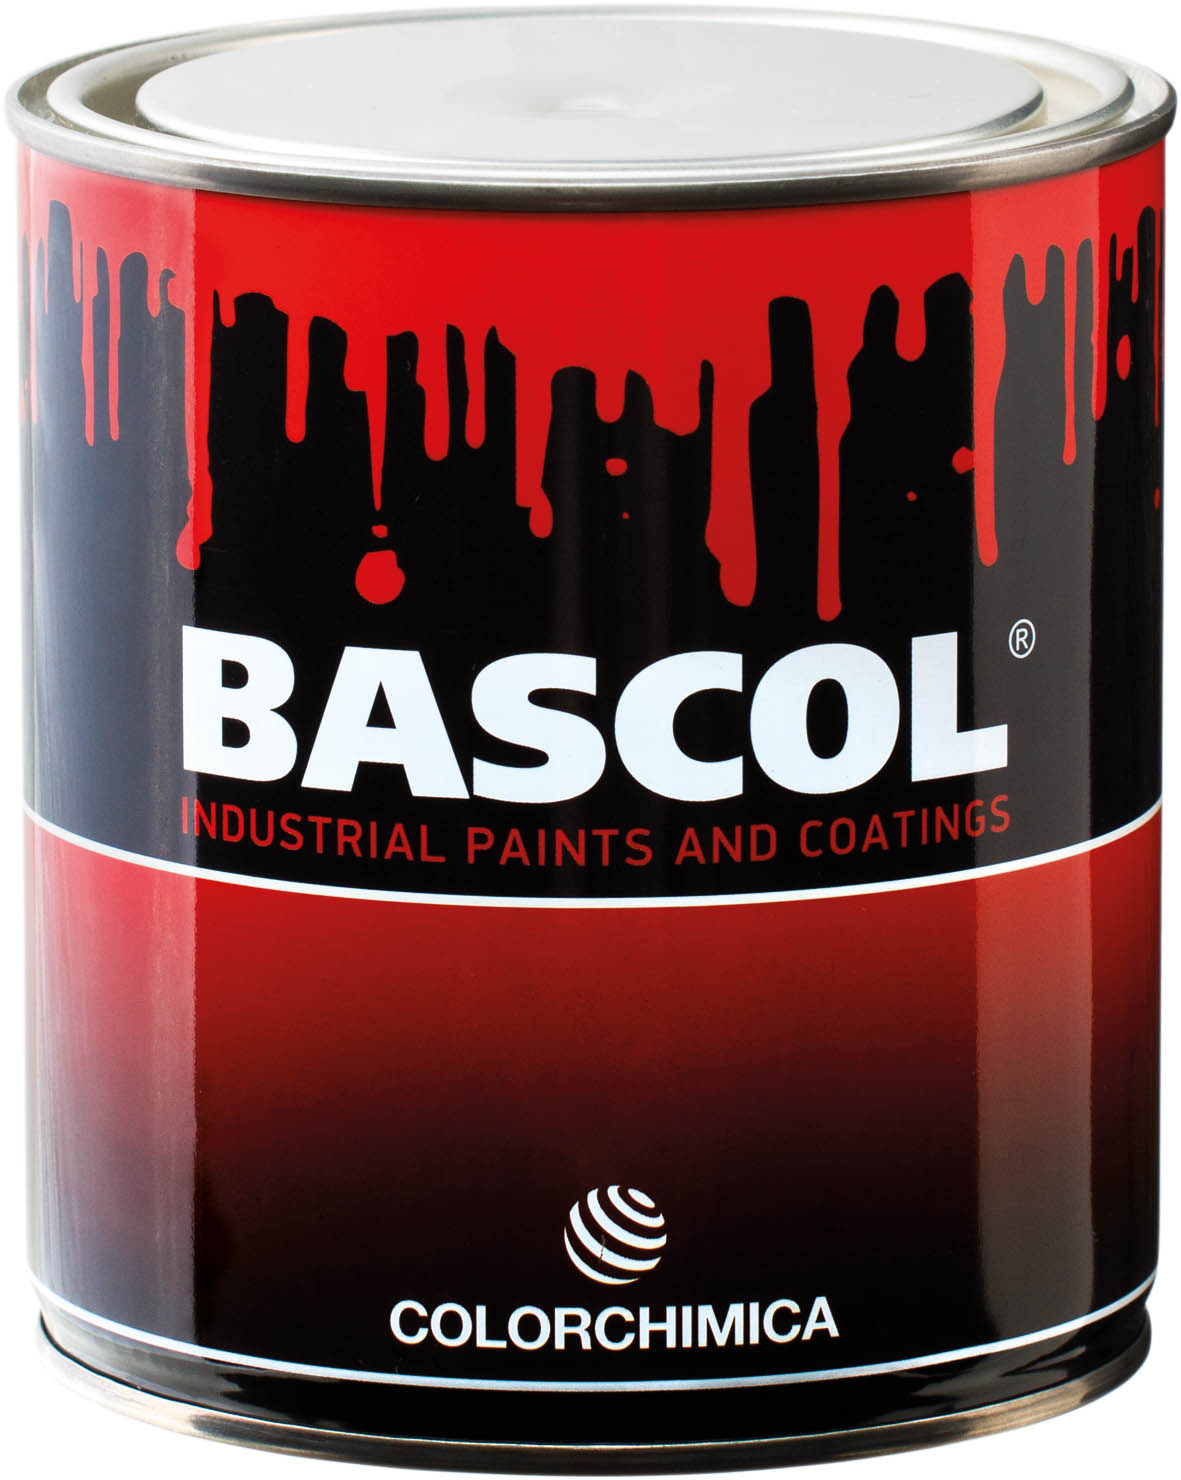 bascol-075